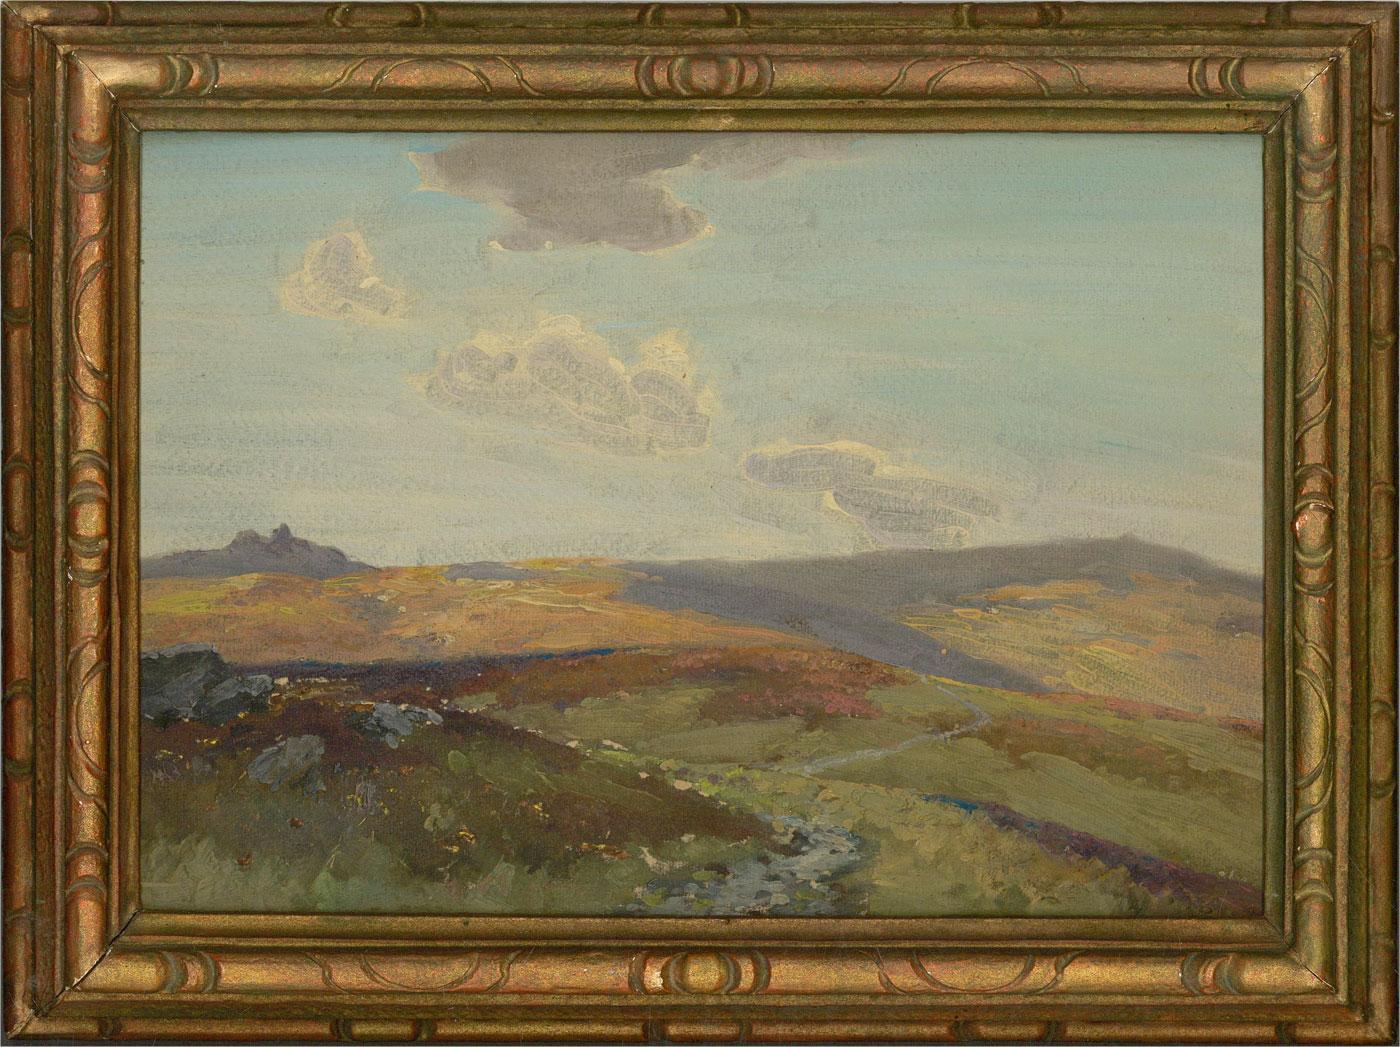 Attrib. Frederick John Widgery (1861-1942) - Early 20th Century Oil, Heathland